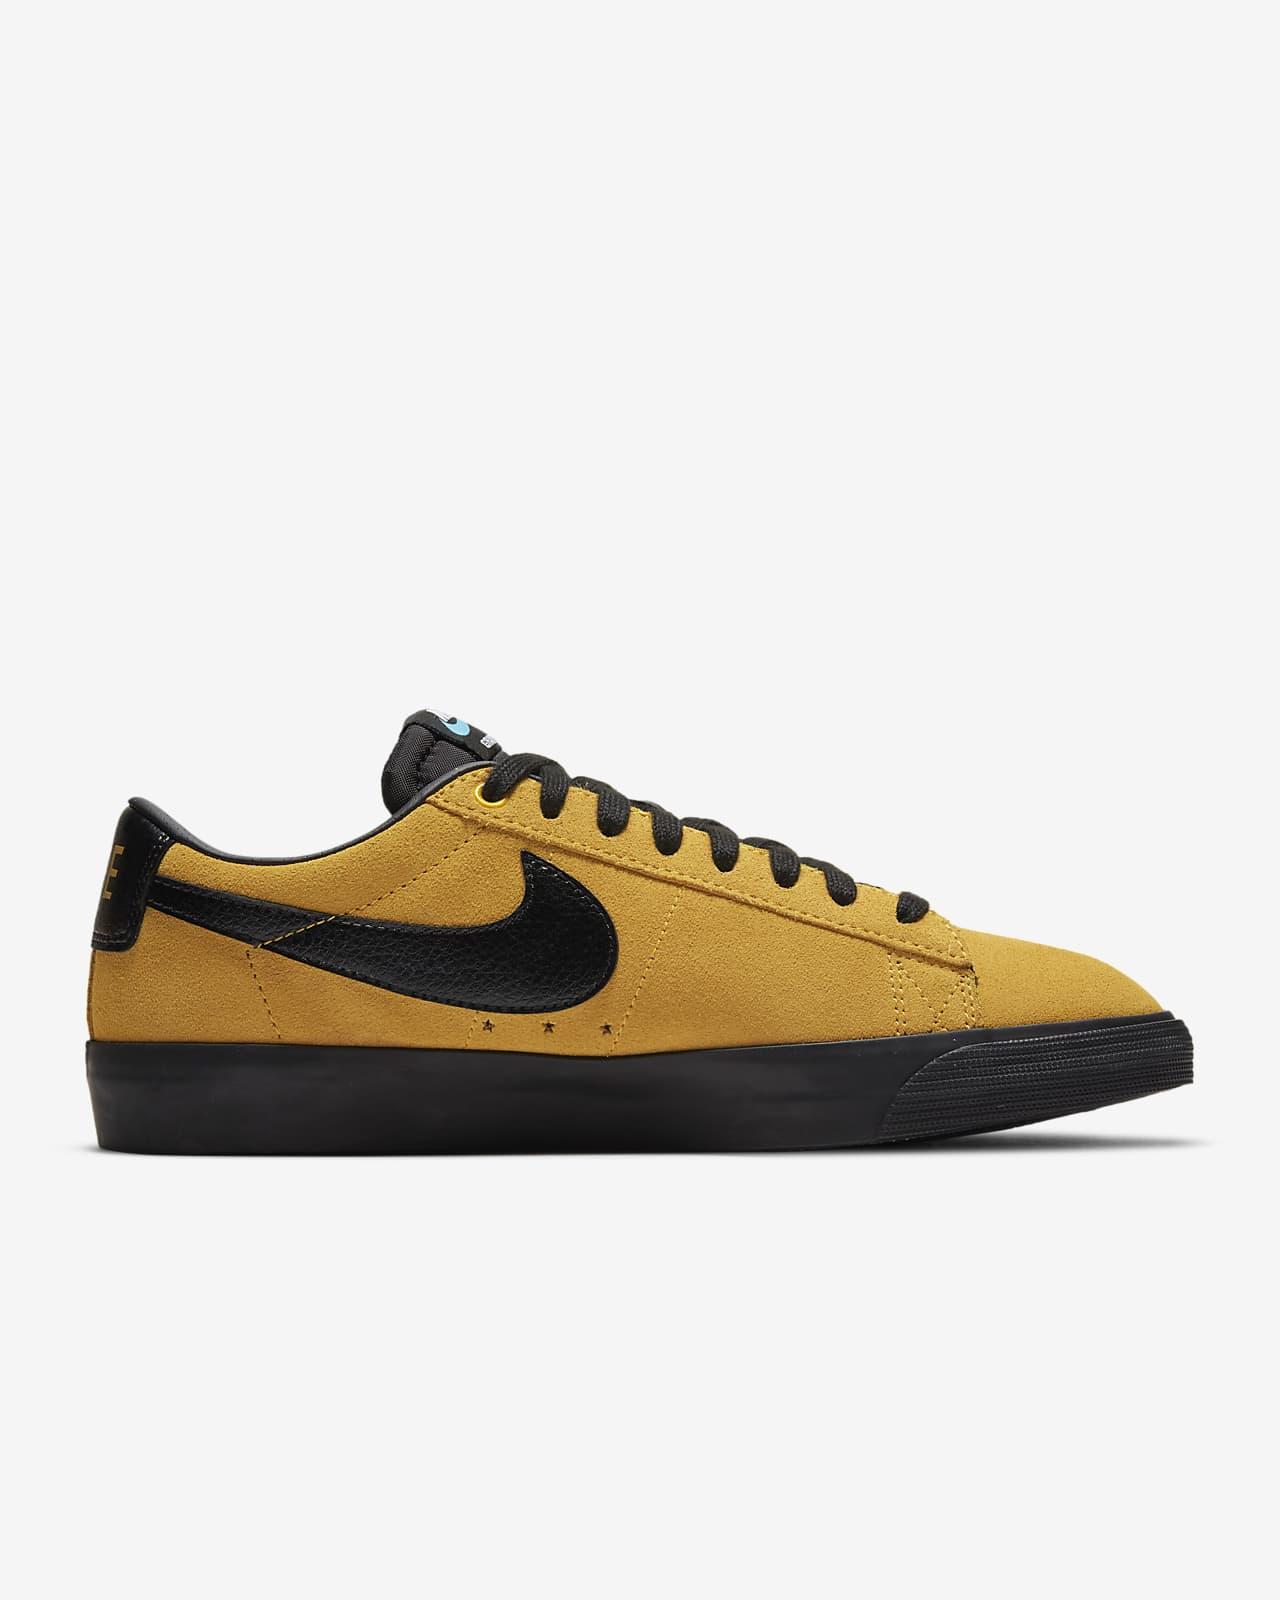 Nike SB Blazer Low GT Skate Shoe. Nike LU